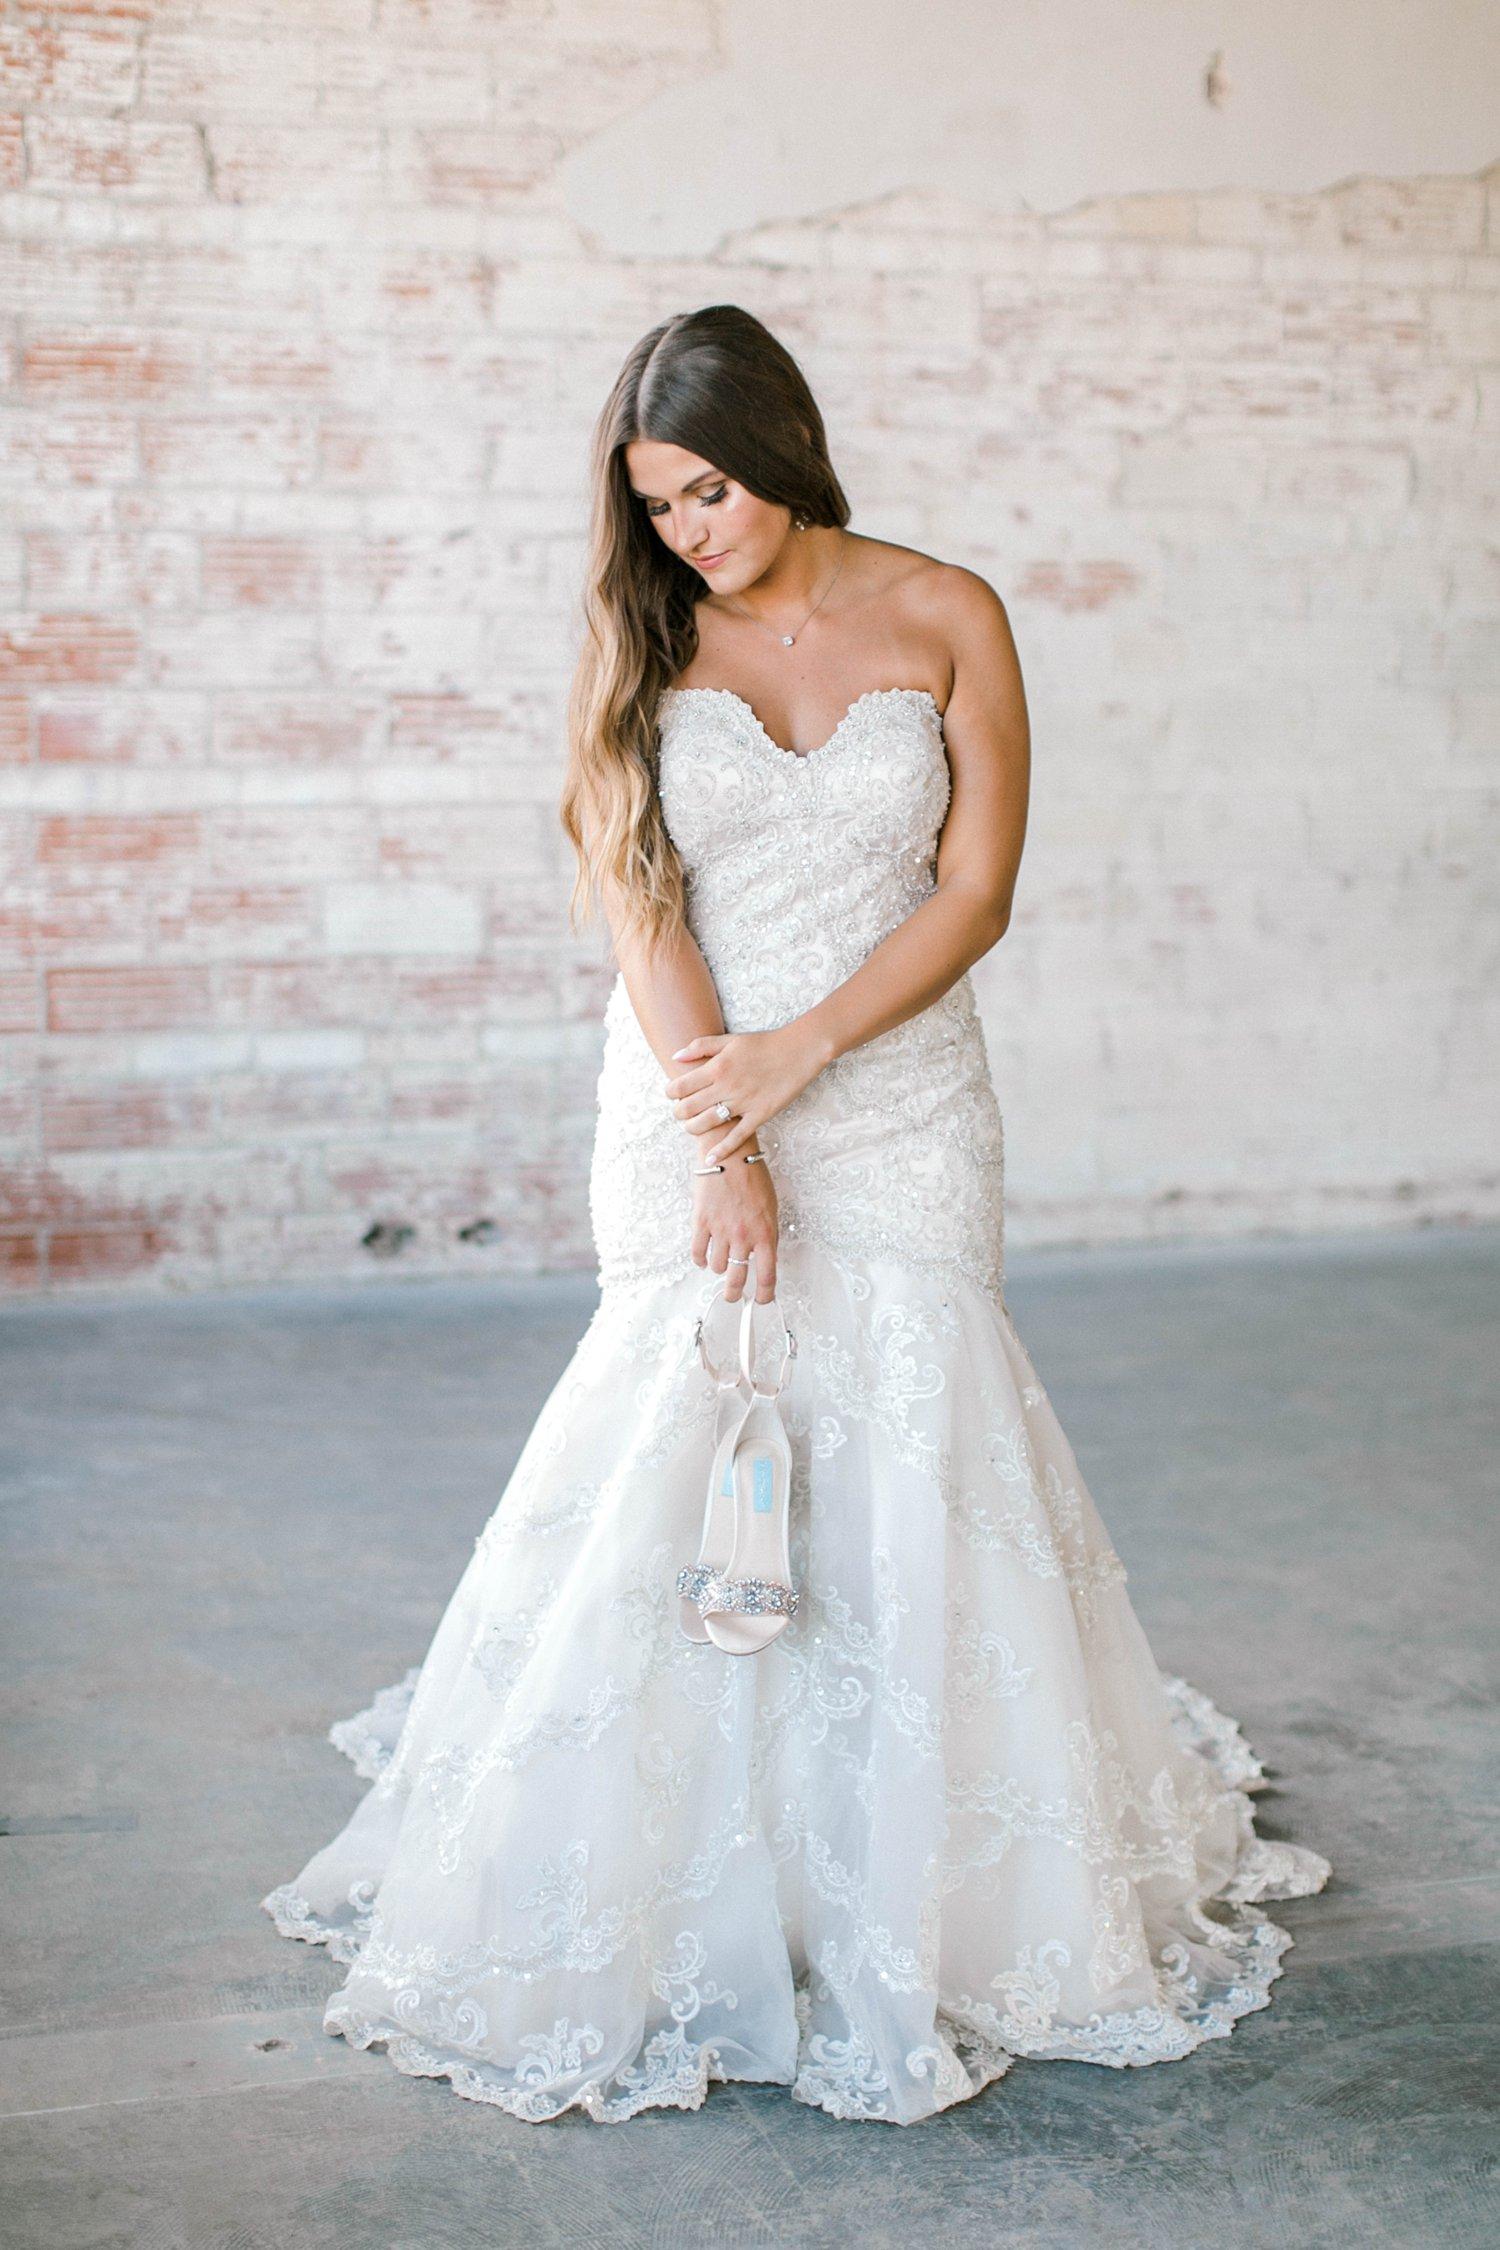 Kendra_Hill_Bridals_ALLEEJ_Lubbock_Wedding_Photographer_LHUCA_0017.jpg